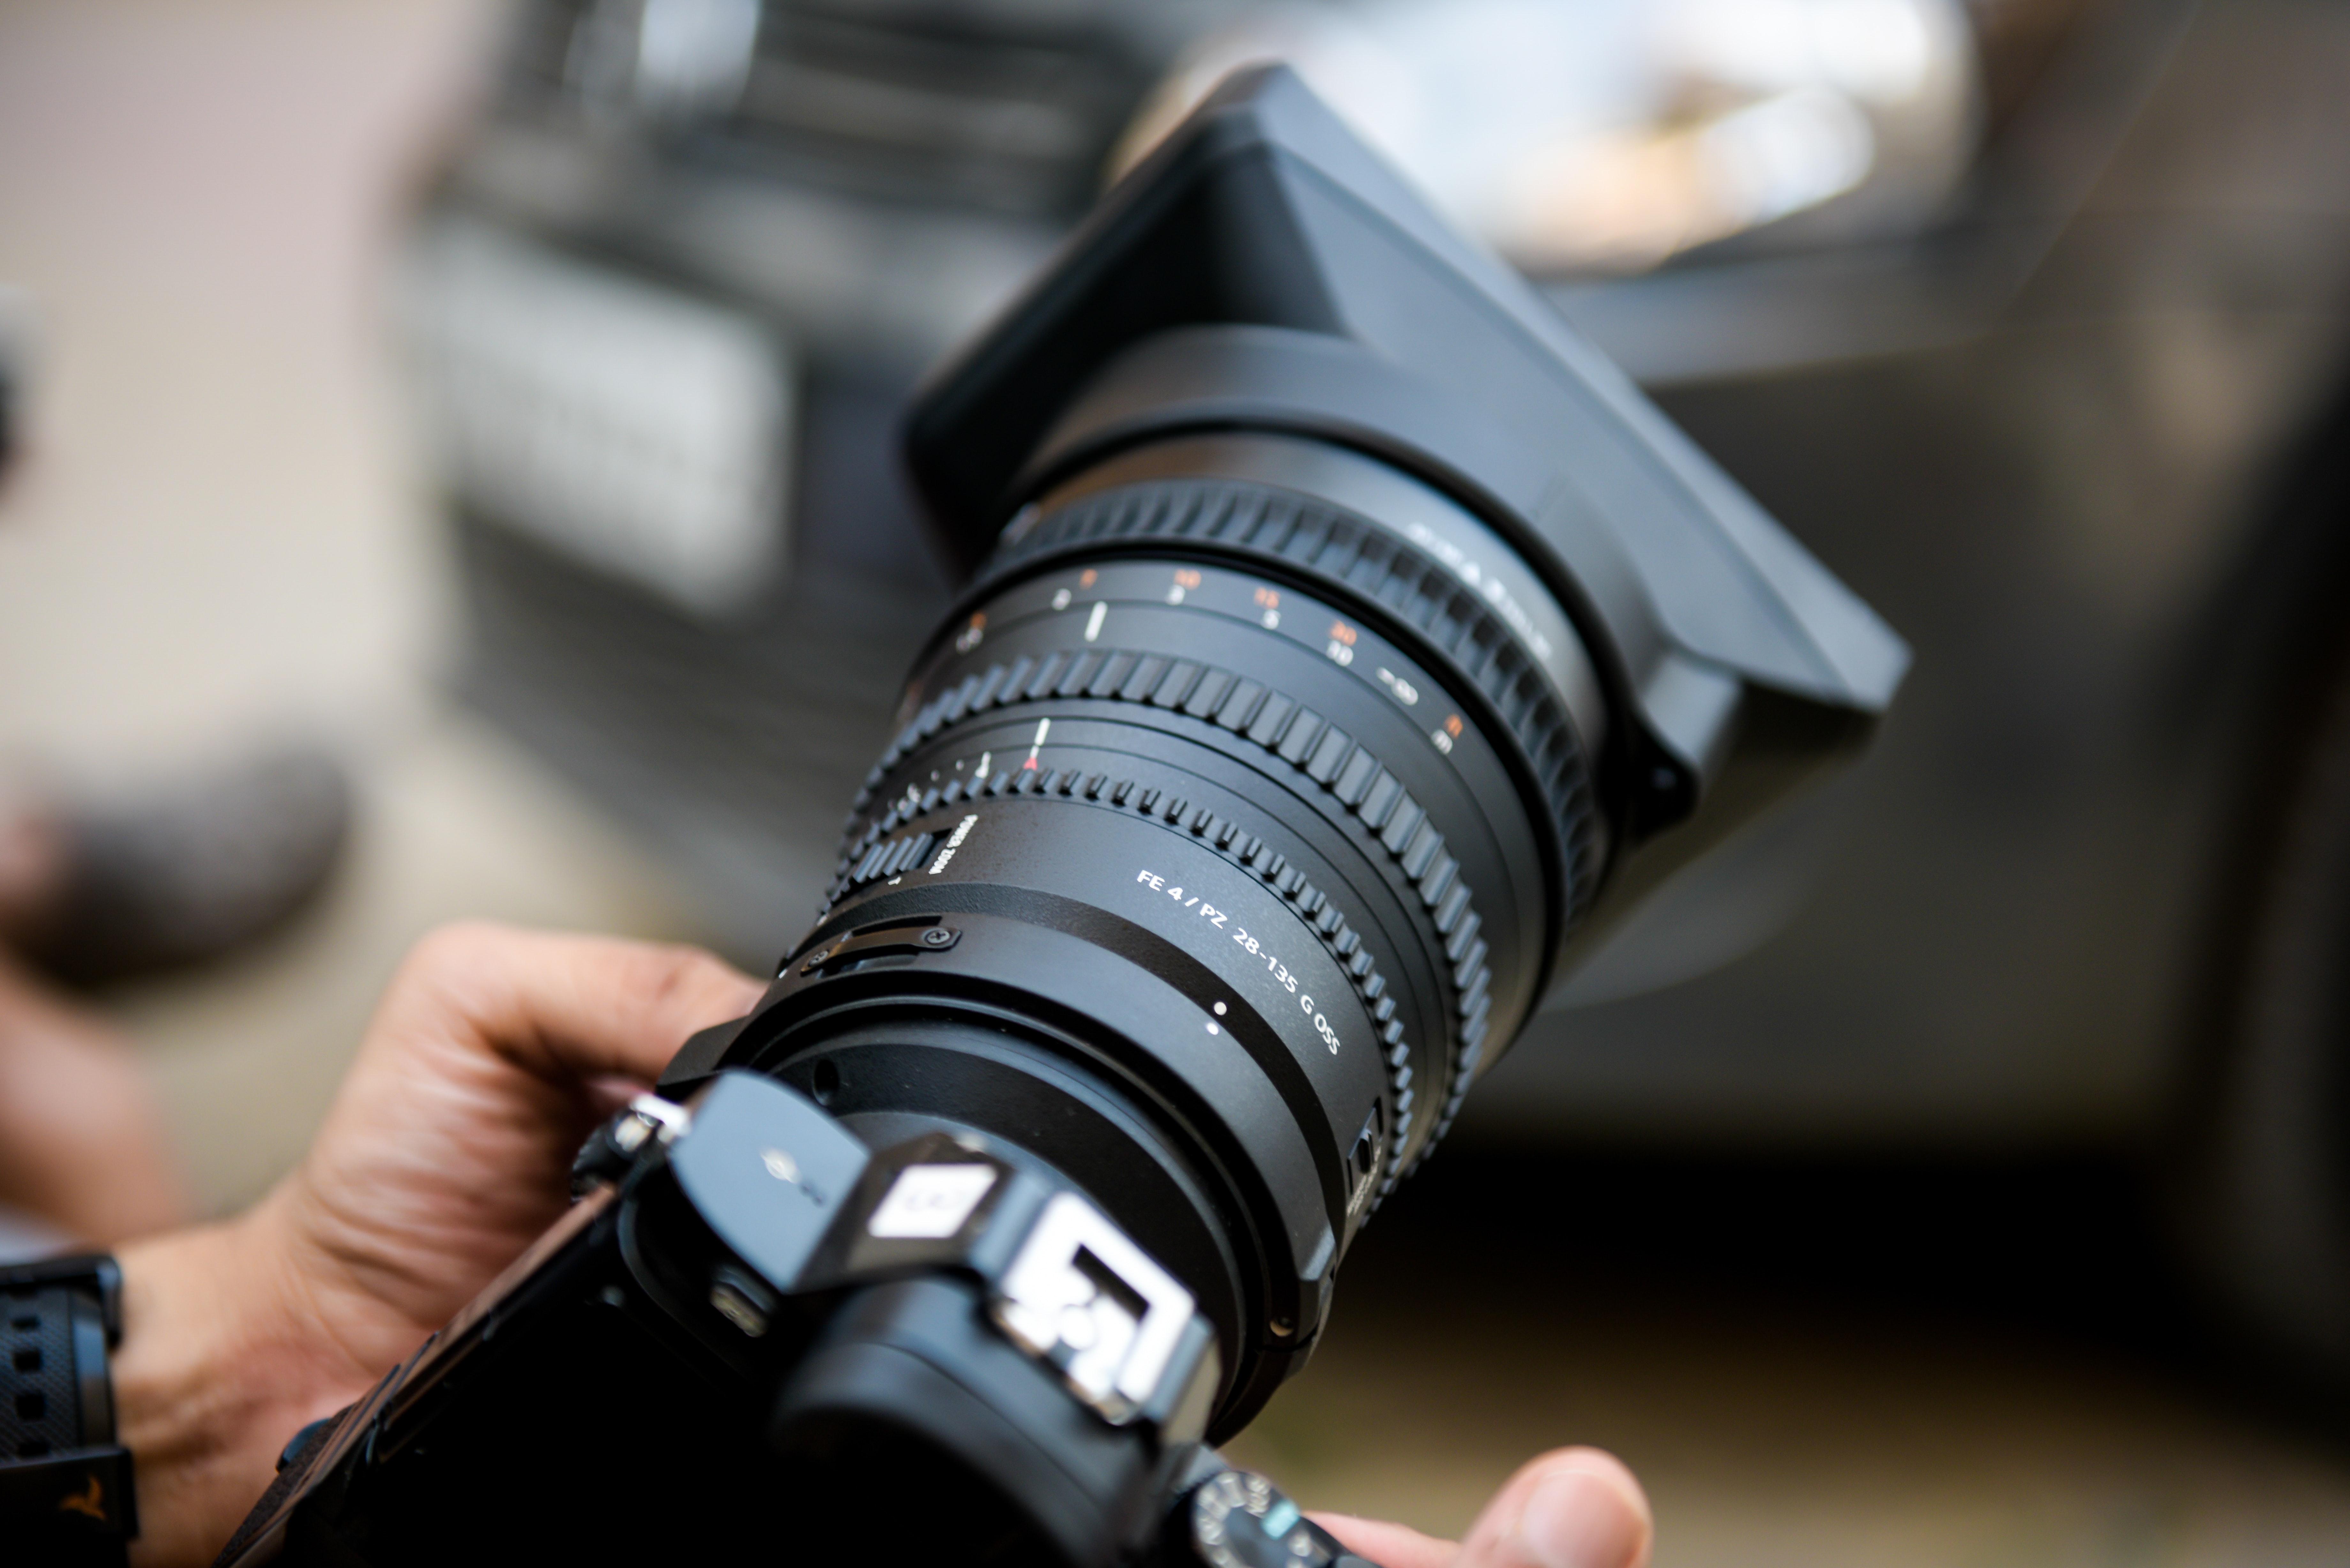 Close-up of Person Using Camera, Analogue, Retro, Optics, Person, HQ Photo